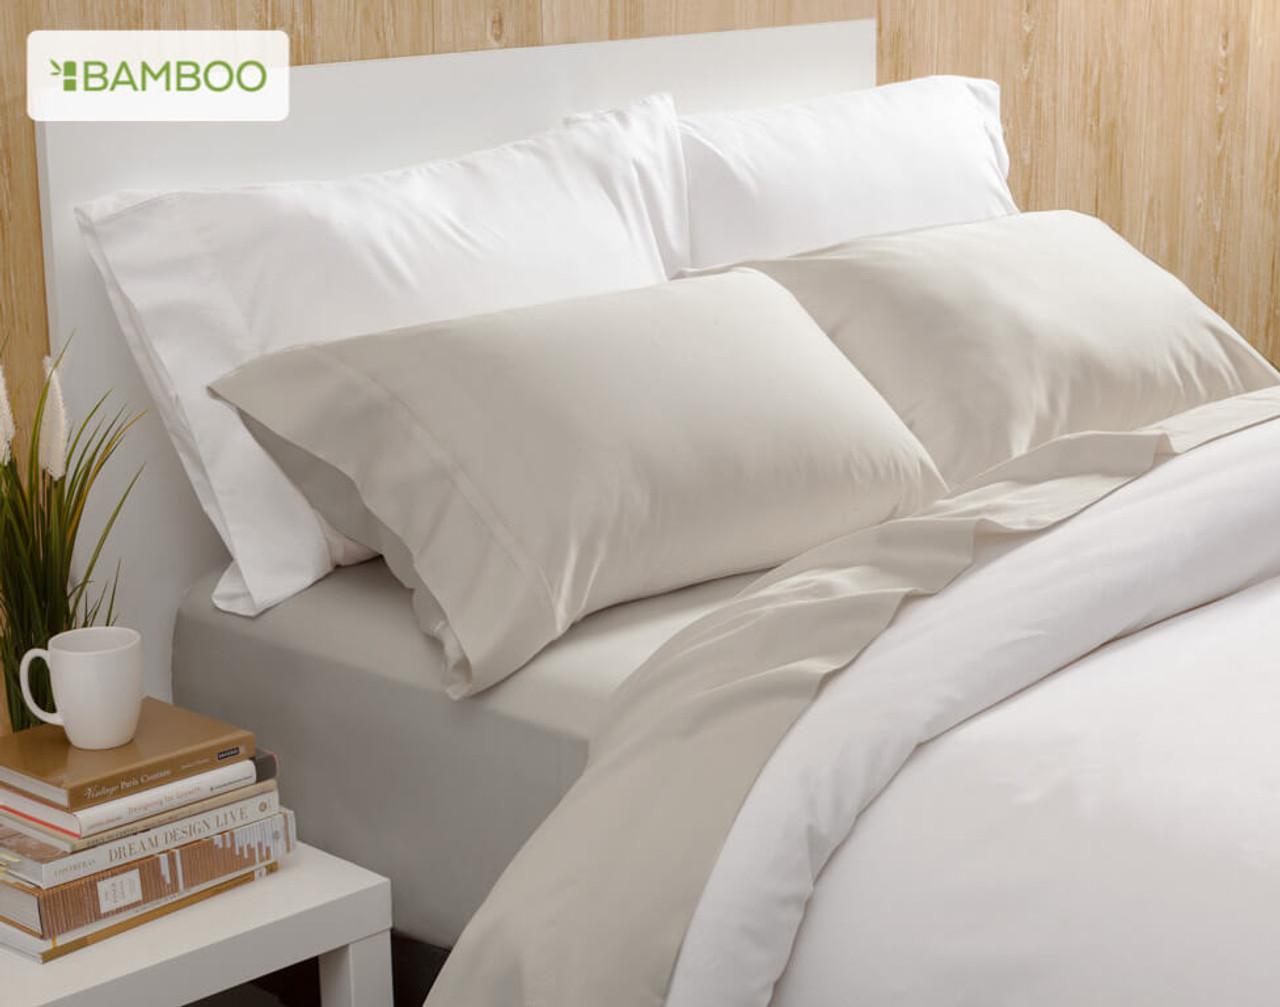 Bamboo Cotton Sheet Set - Driftwood (Twin & Twin XL Only)